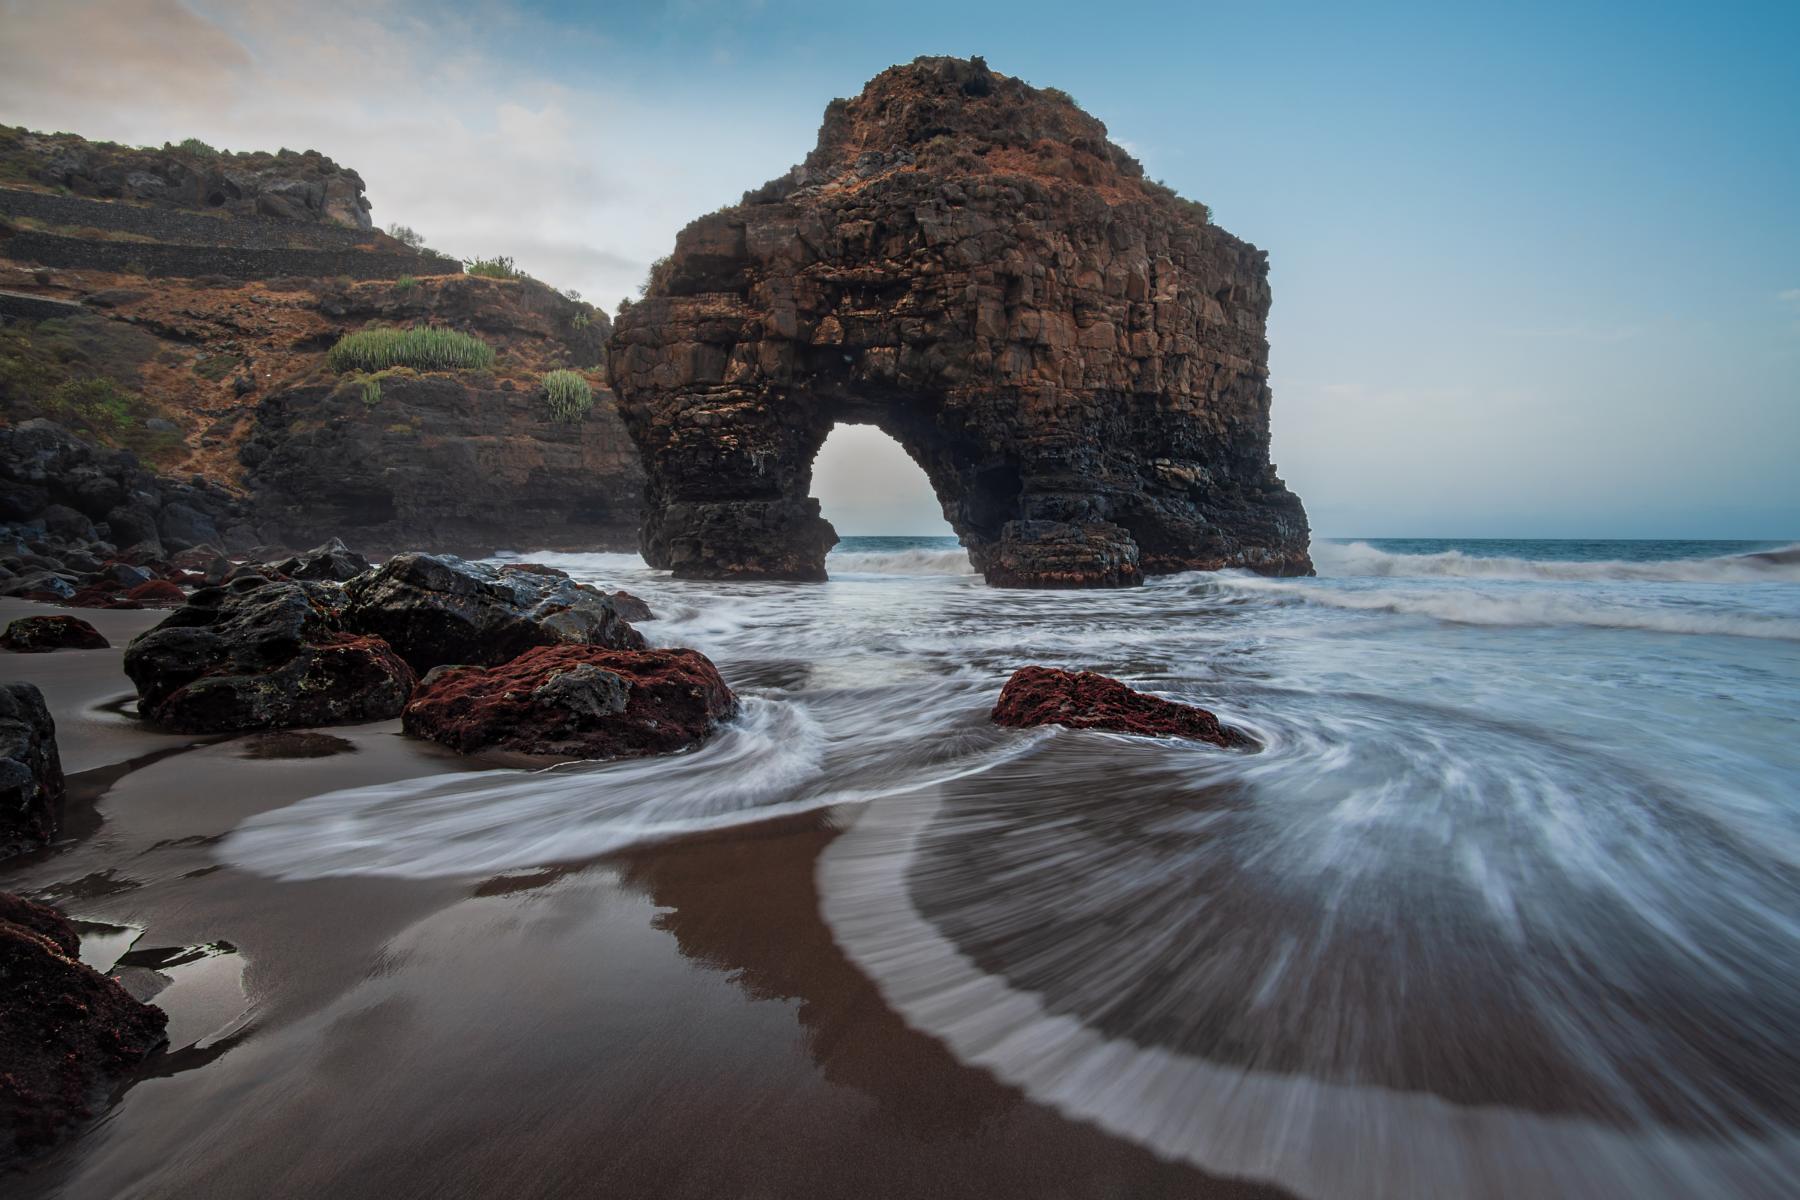 Playa des los Roques